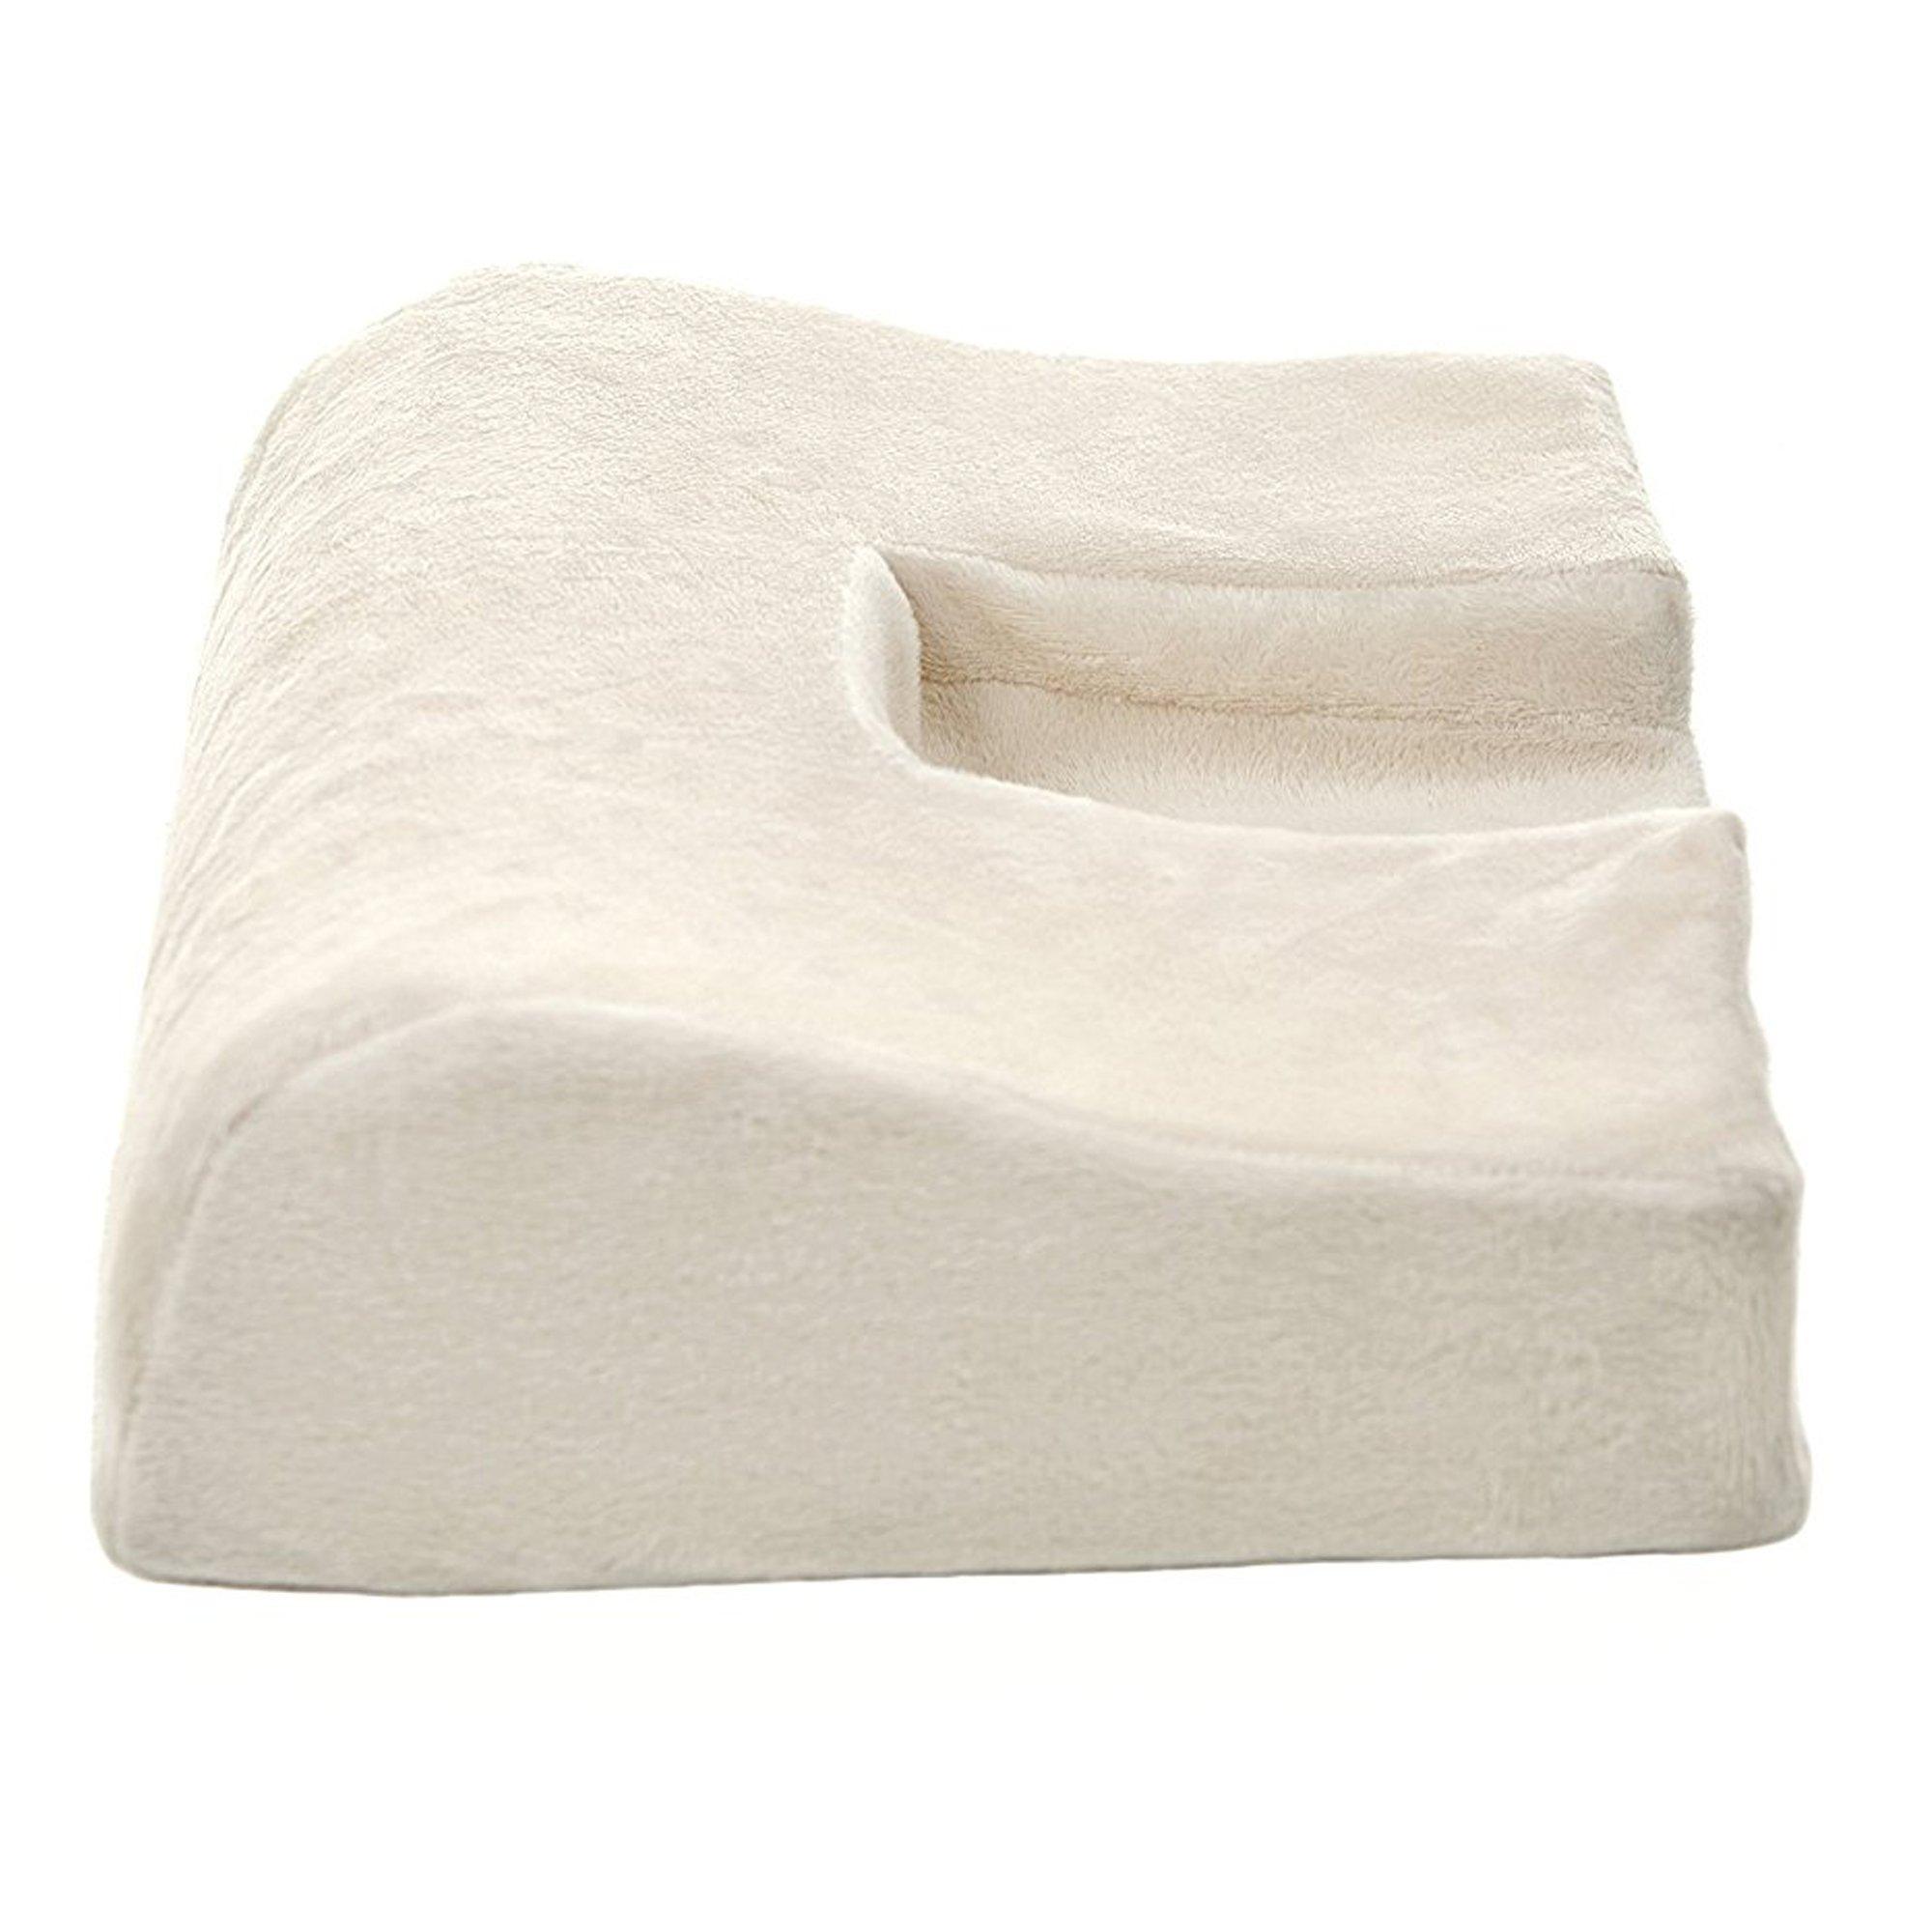 Cheap Large Bath Pillow, find Large Bath Pillow deals on line at ...